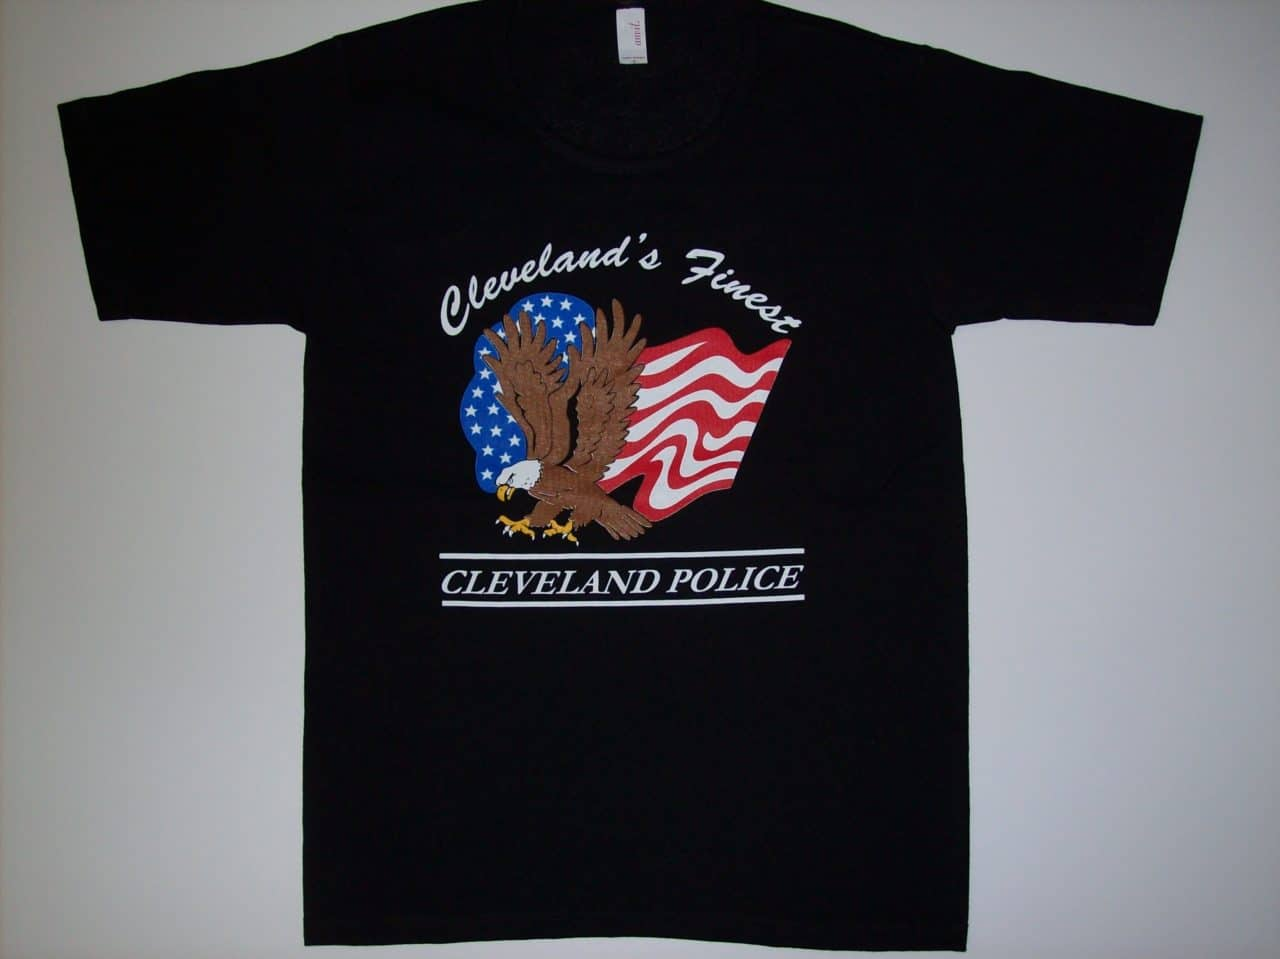 Ladies scoop neck Cleveland's Finest T-shirt